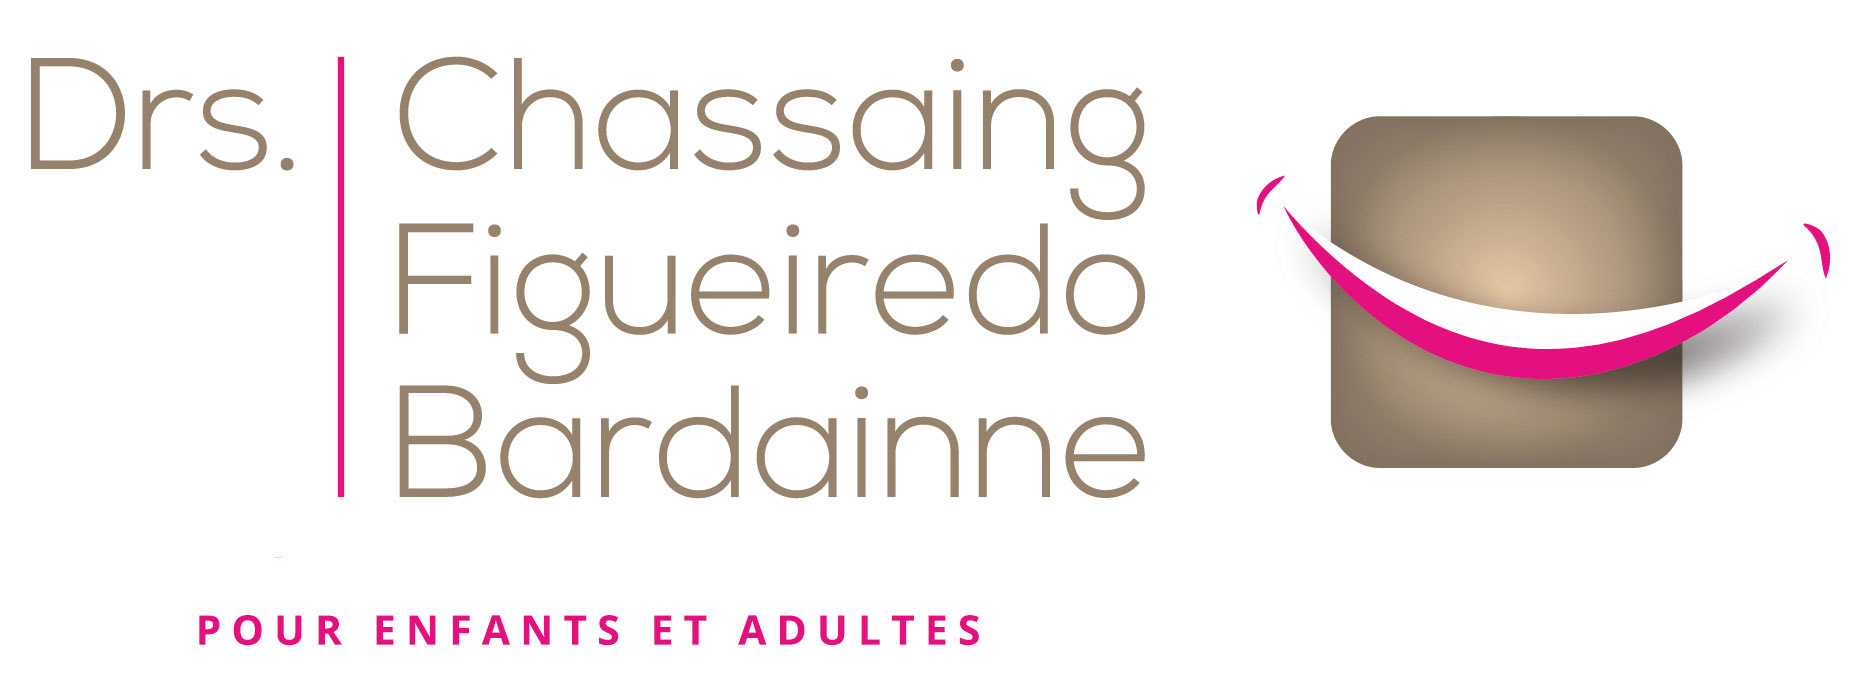 Drs Chassaing, Figueiredo & Bardainne - Chirurgiens dentistes à Avranches et Dol de Bretagne